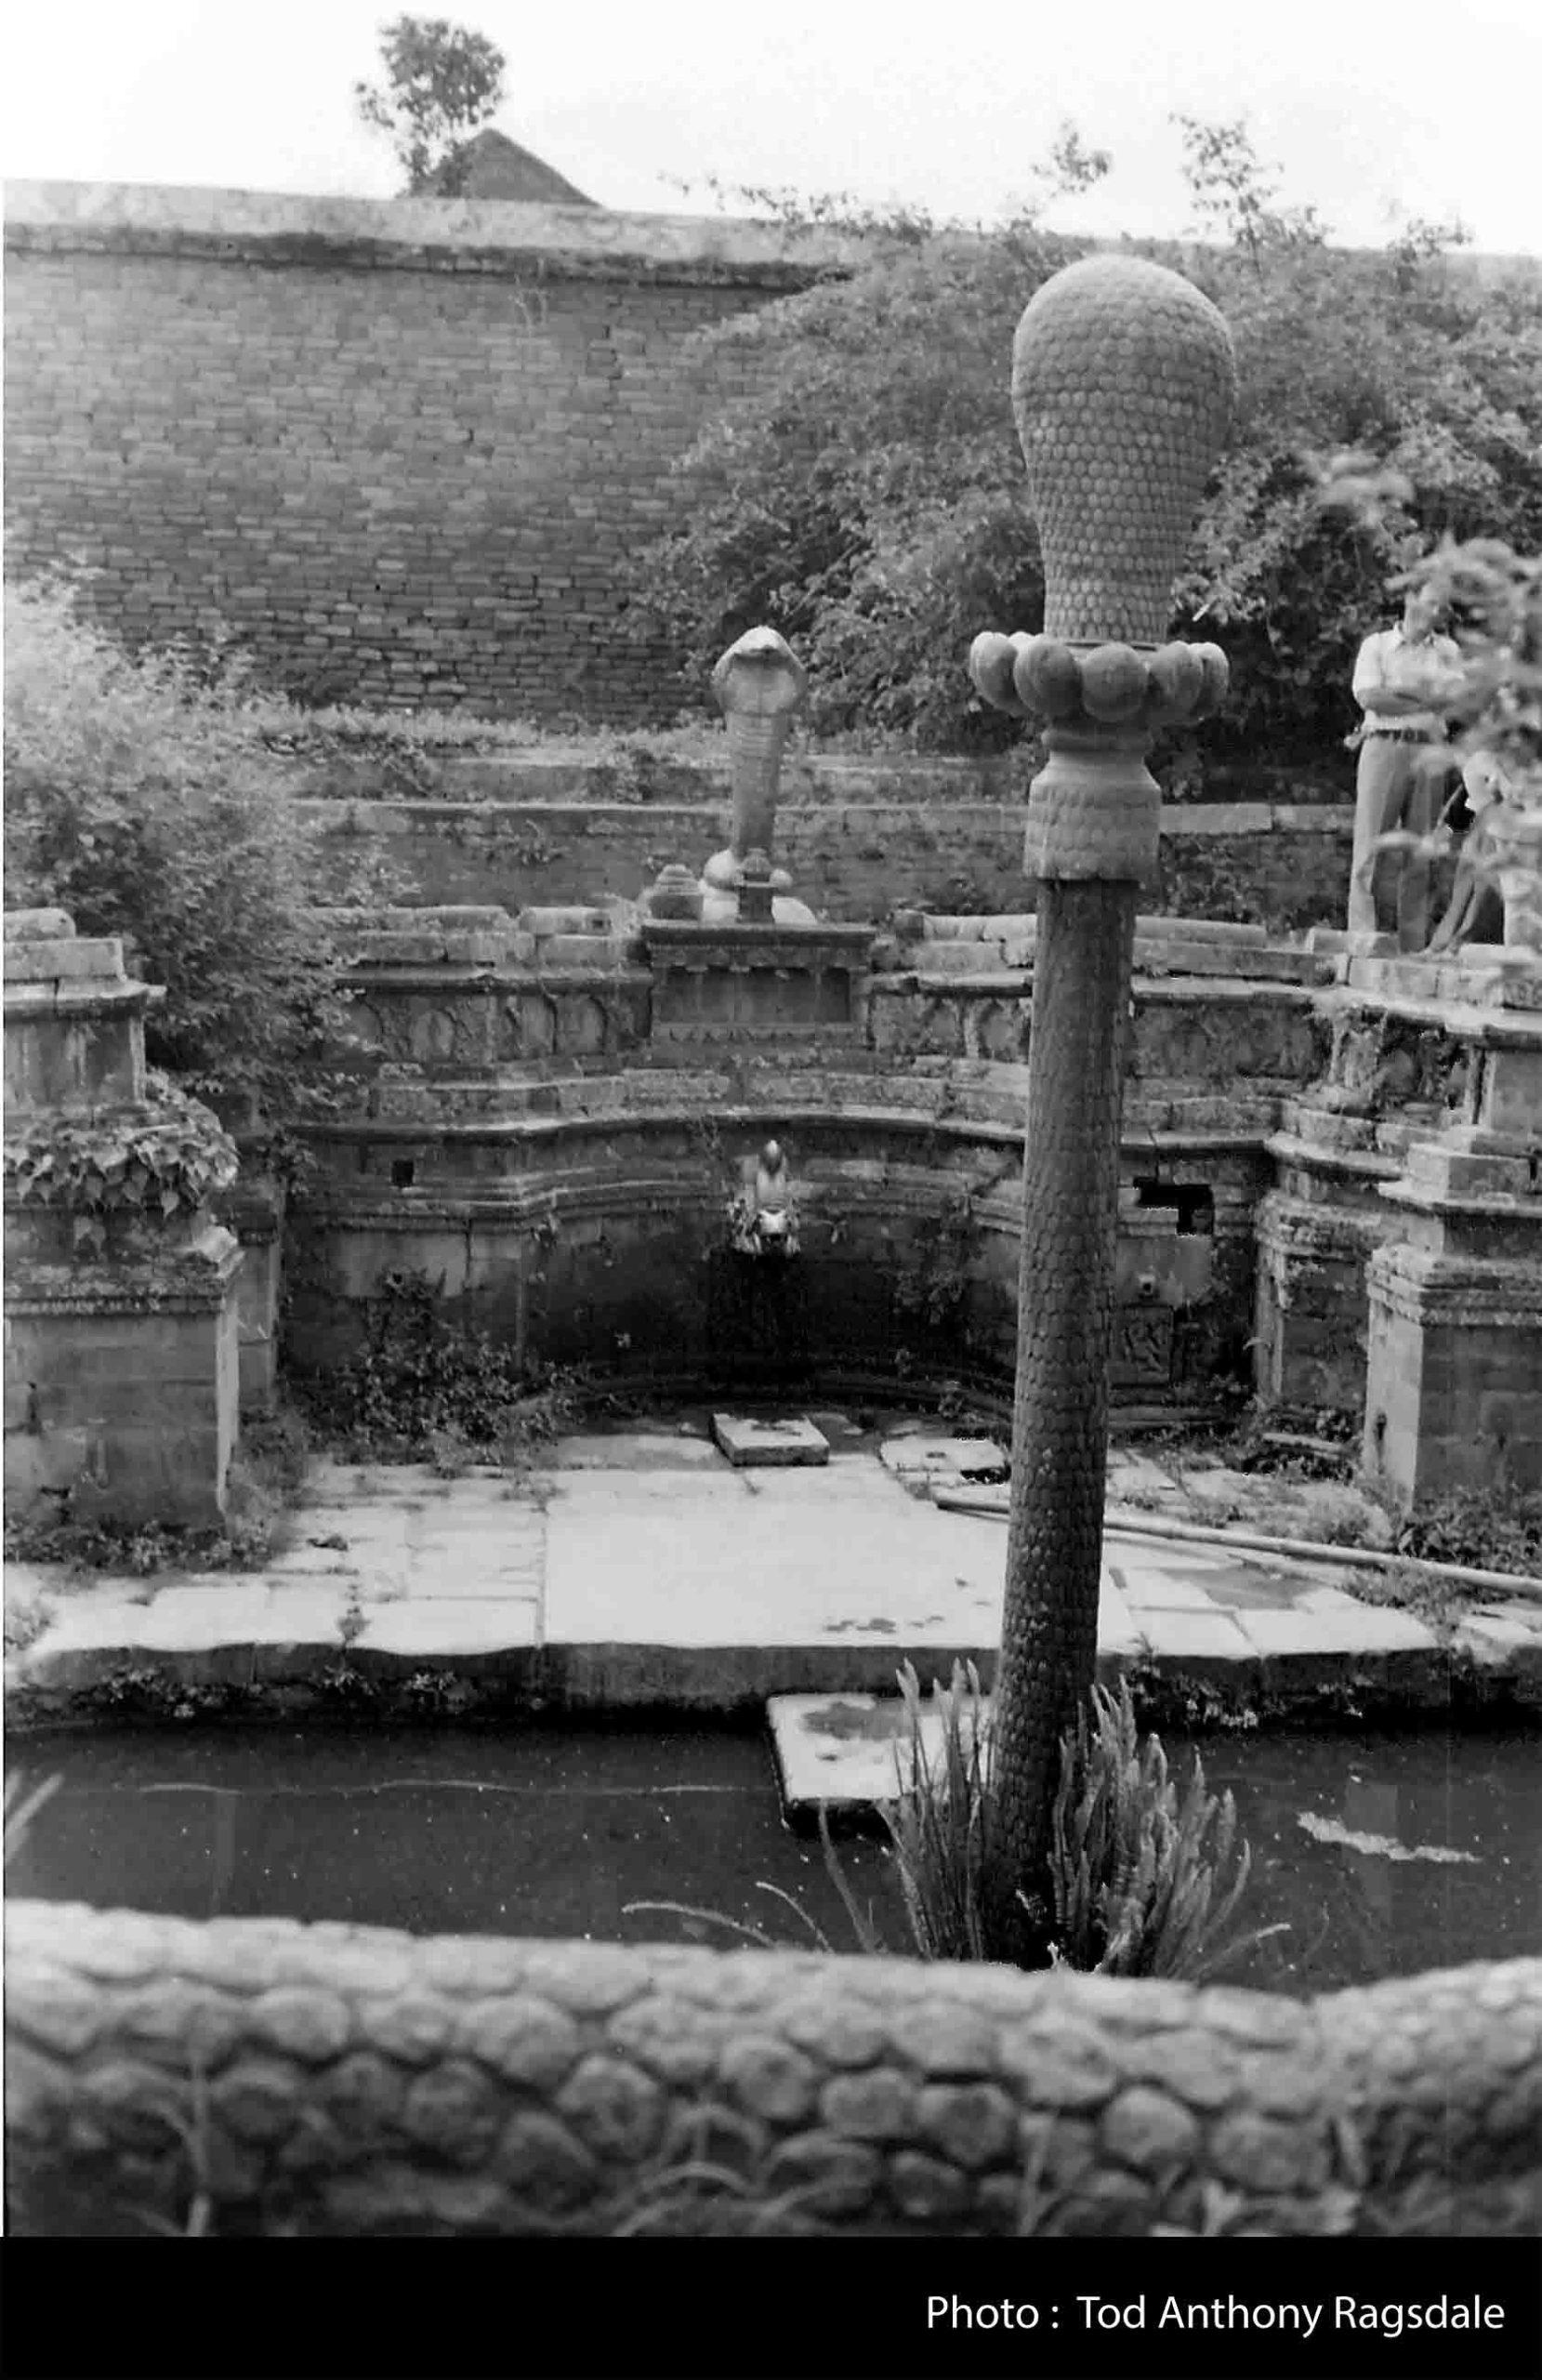 Nag pokhari inside goldengate image